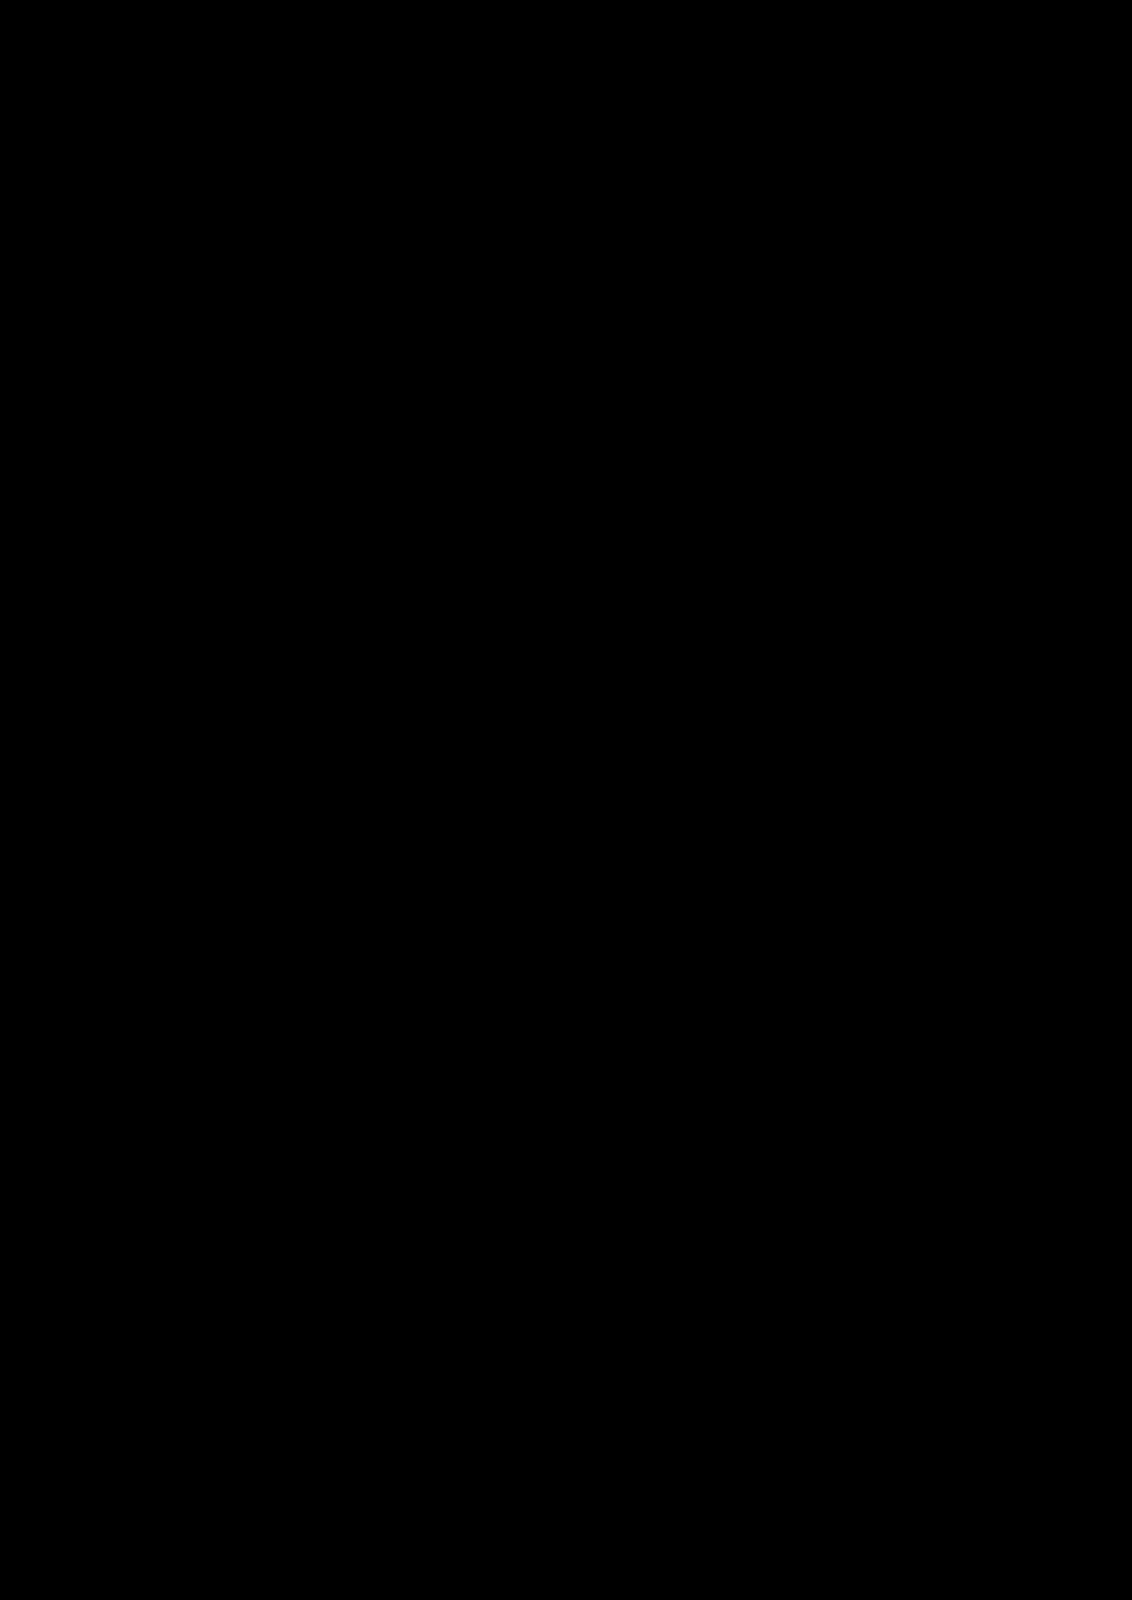 Decorative Borders For Word Similiar Simple Certificate Border Keywords